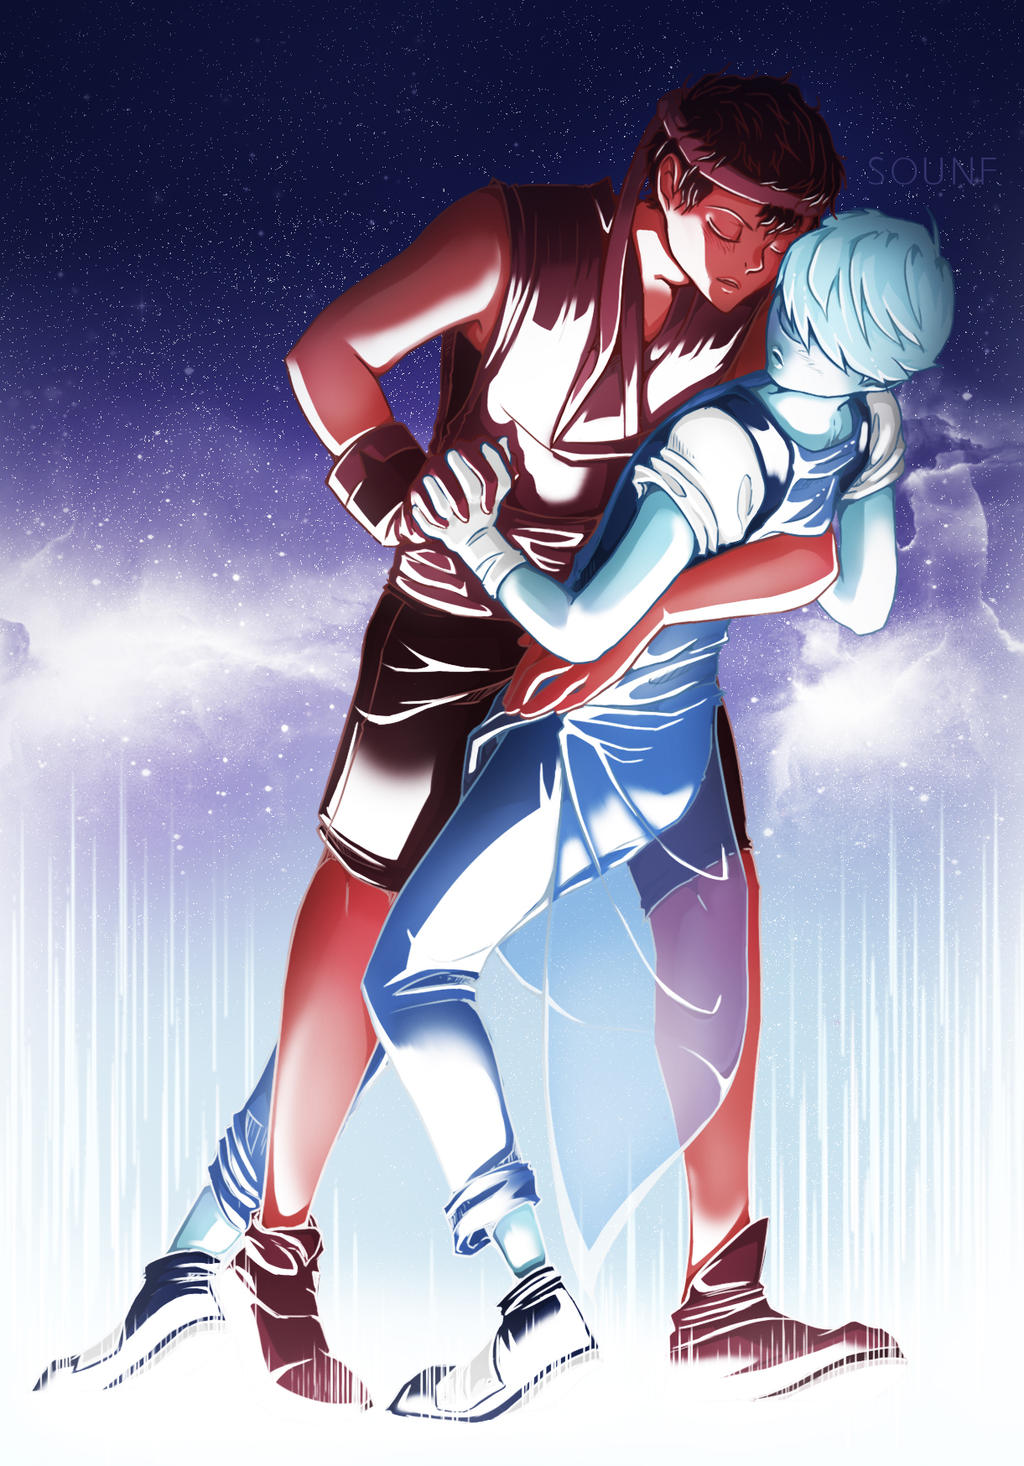 Genderbend Ruby X Sapphire By Sounf On Deviantart